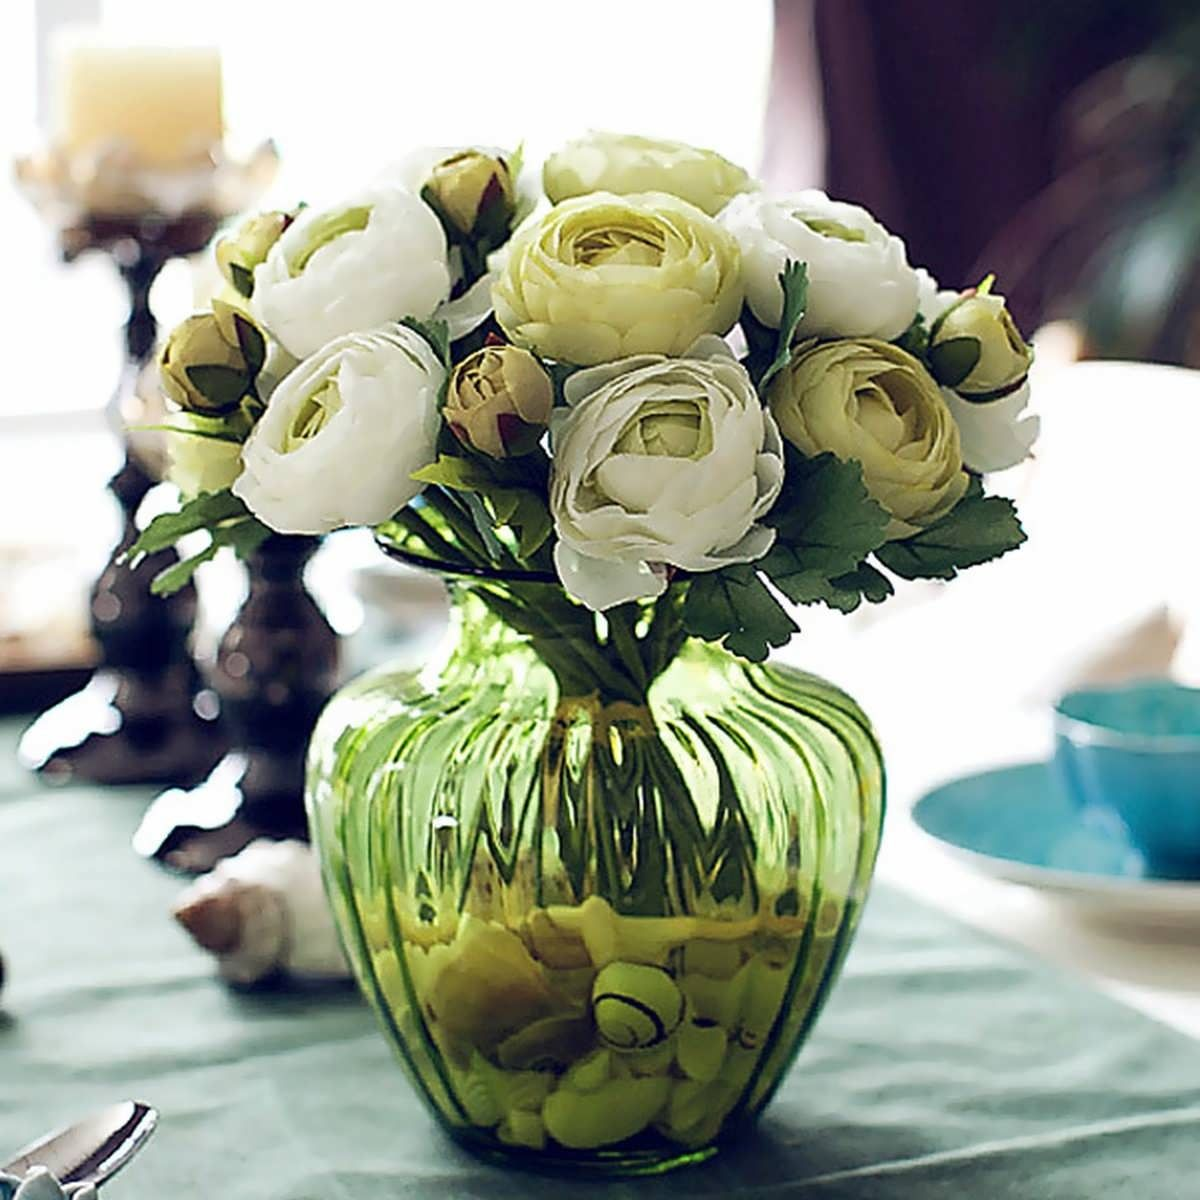 Description Artificial Silk Flower Peony Bouquet 9 Heads